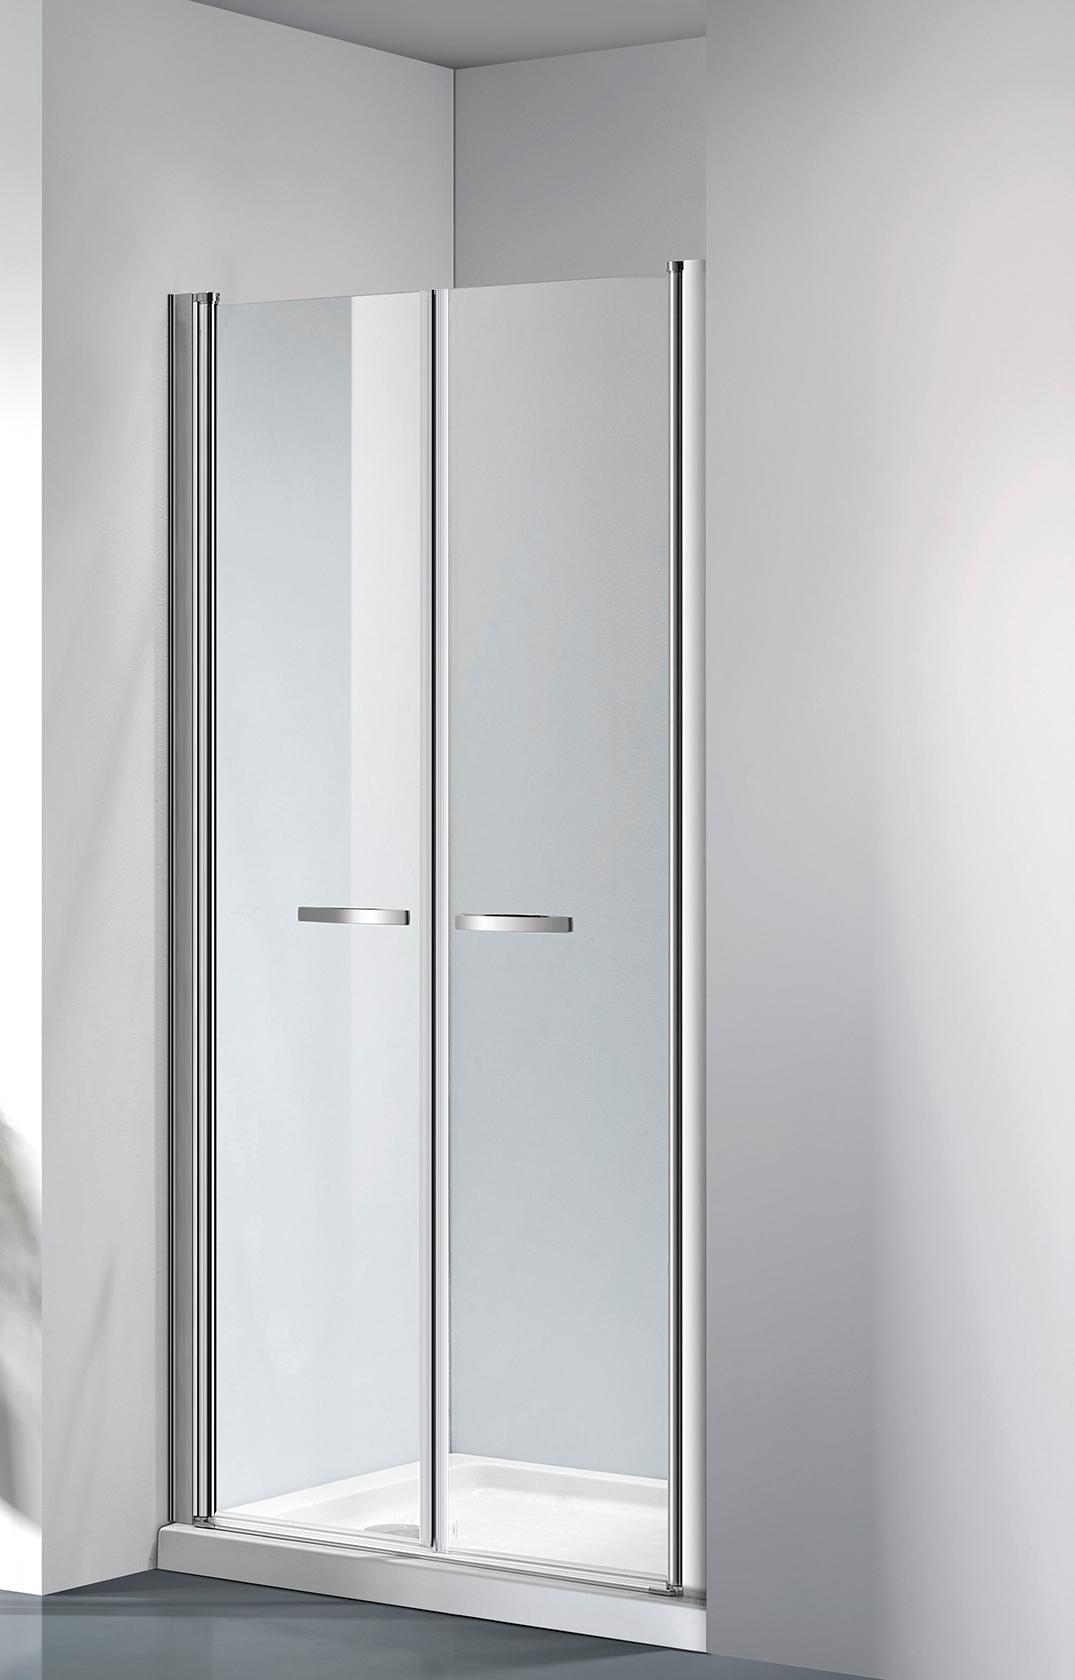 ARTTEC COMFORT 101-106 grape NEW- Sprchové dveře do niky